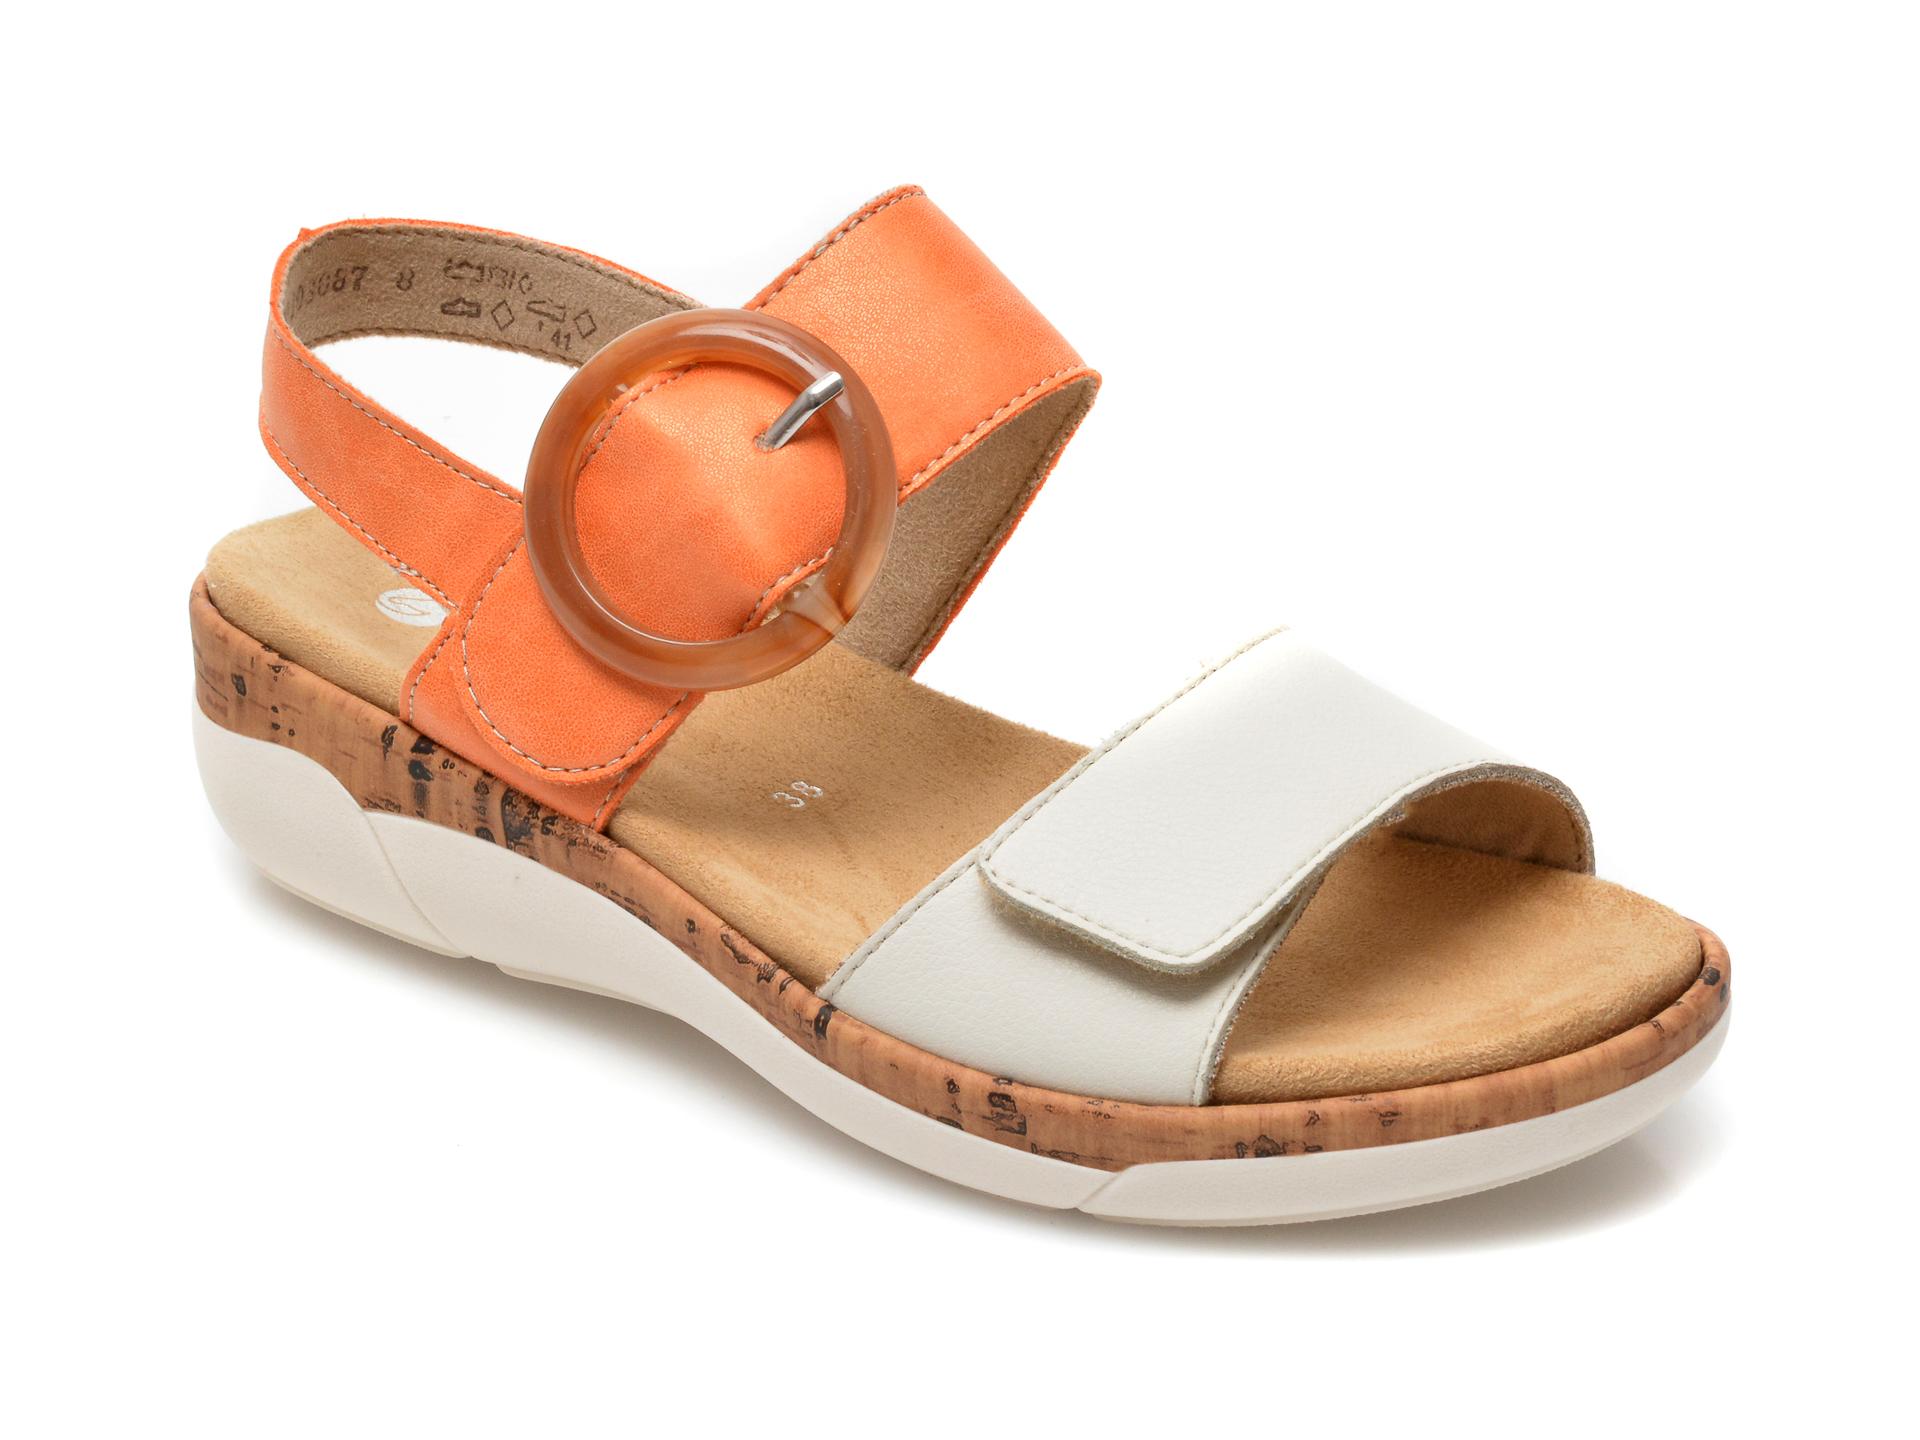 Sandale REMONTE bej, R6853, din piele naturala imagine otter.ro 2021